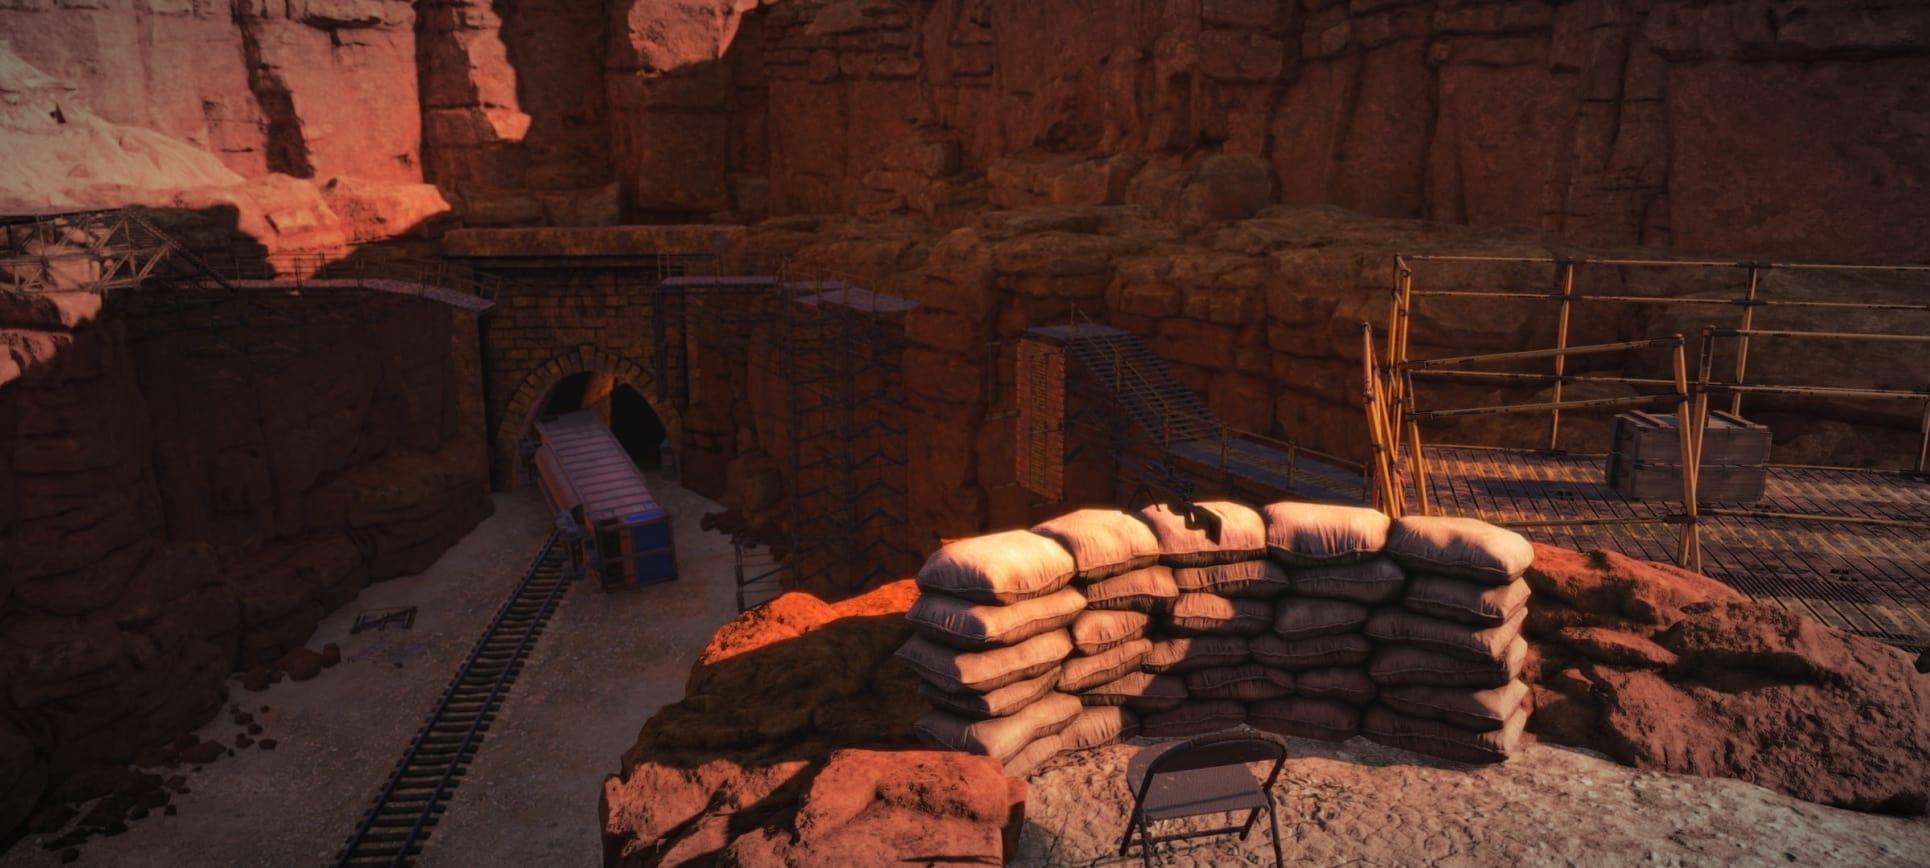 VR 殭屍遊戲《亞利桑那的陽光 Arizona Sunshine》今日上市《Arizona Sunshine》